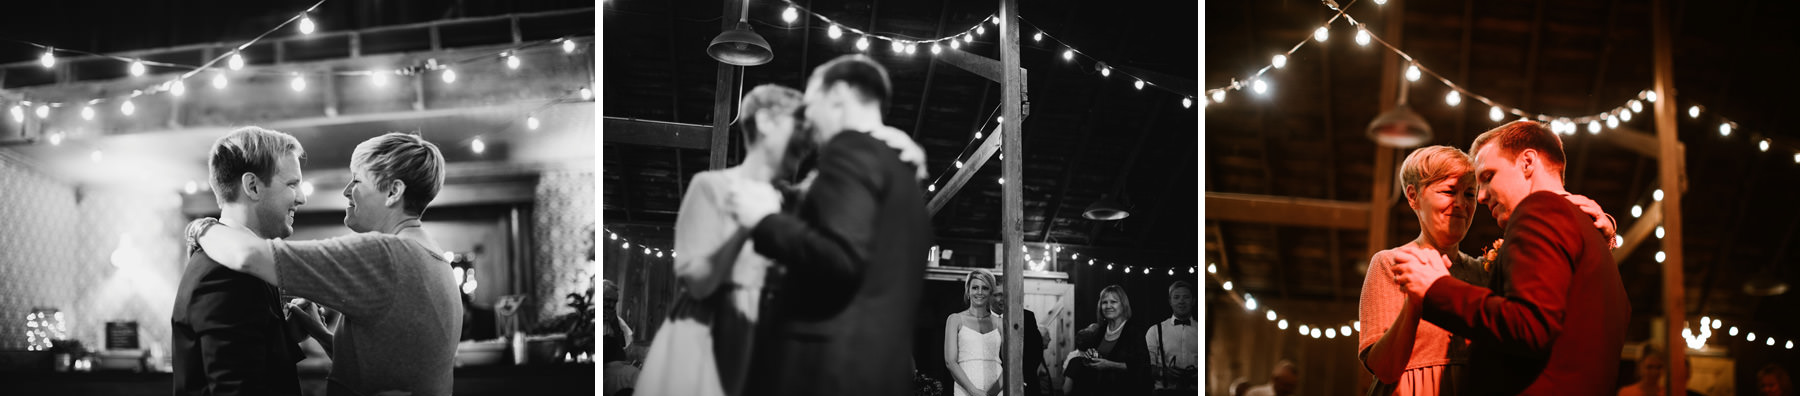 Alldredge Orchard Kansas City_Kindling Wedding Photography BLOG 77.JPG